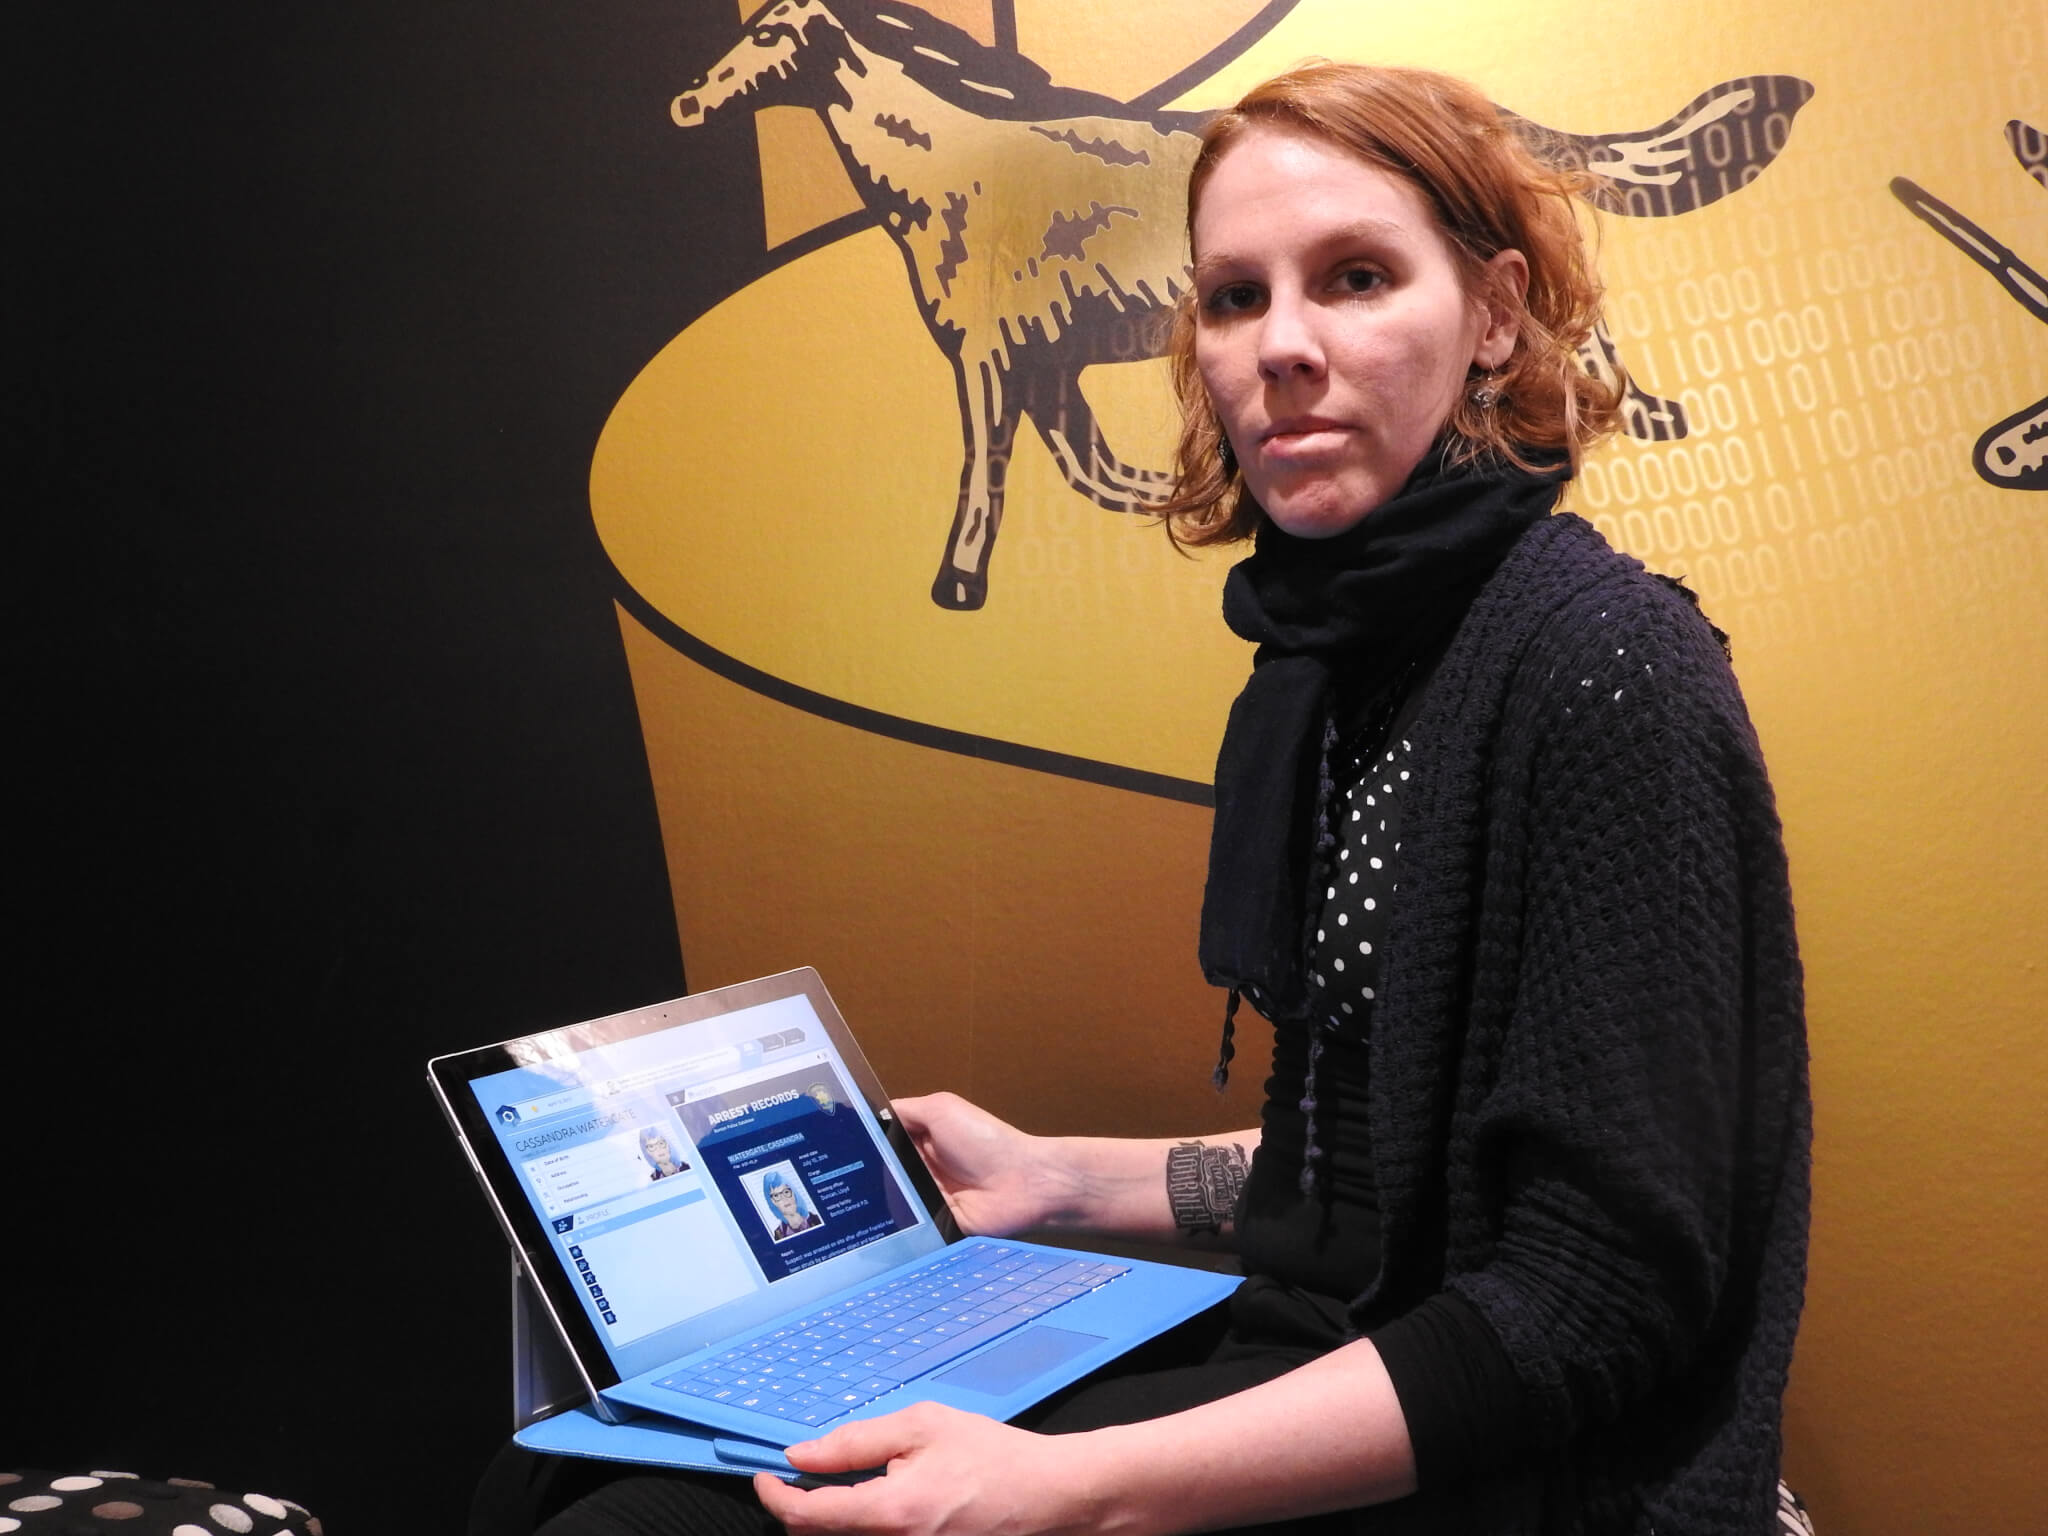 Melanie Taylor shows off Orwell at GDC 2017.